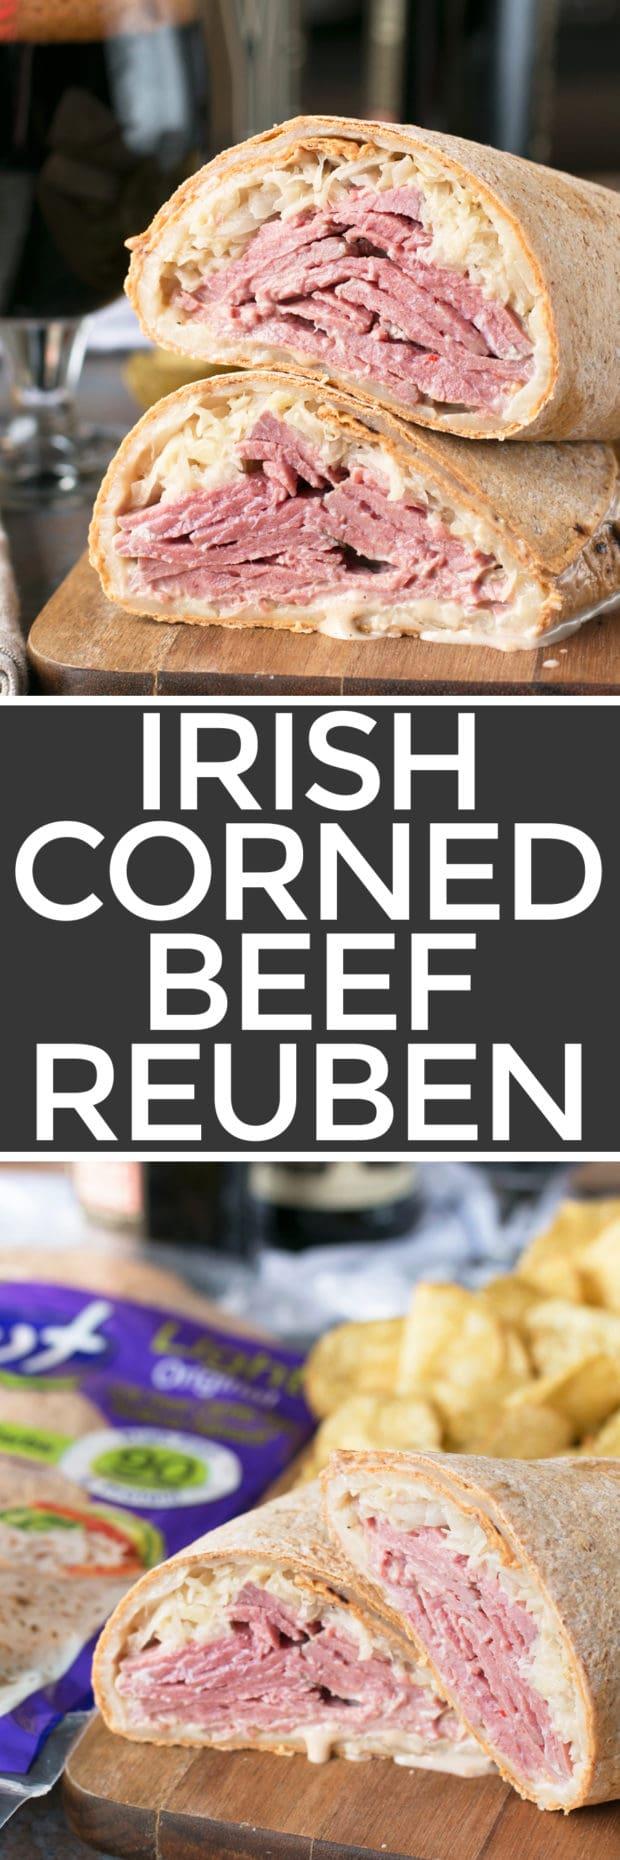 Irish Corned Beef Reuben Wrap   cakenknife.com #sandwich #lunch